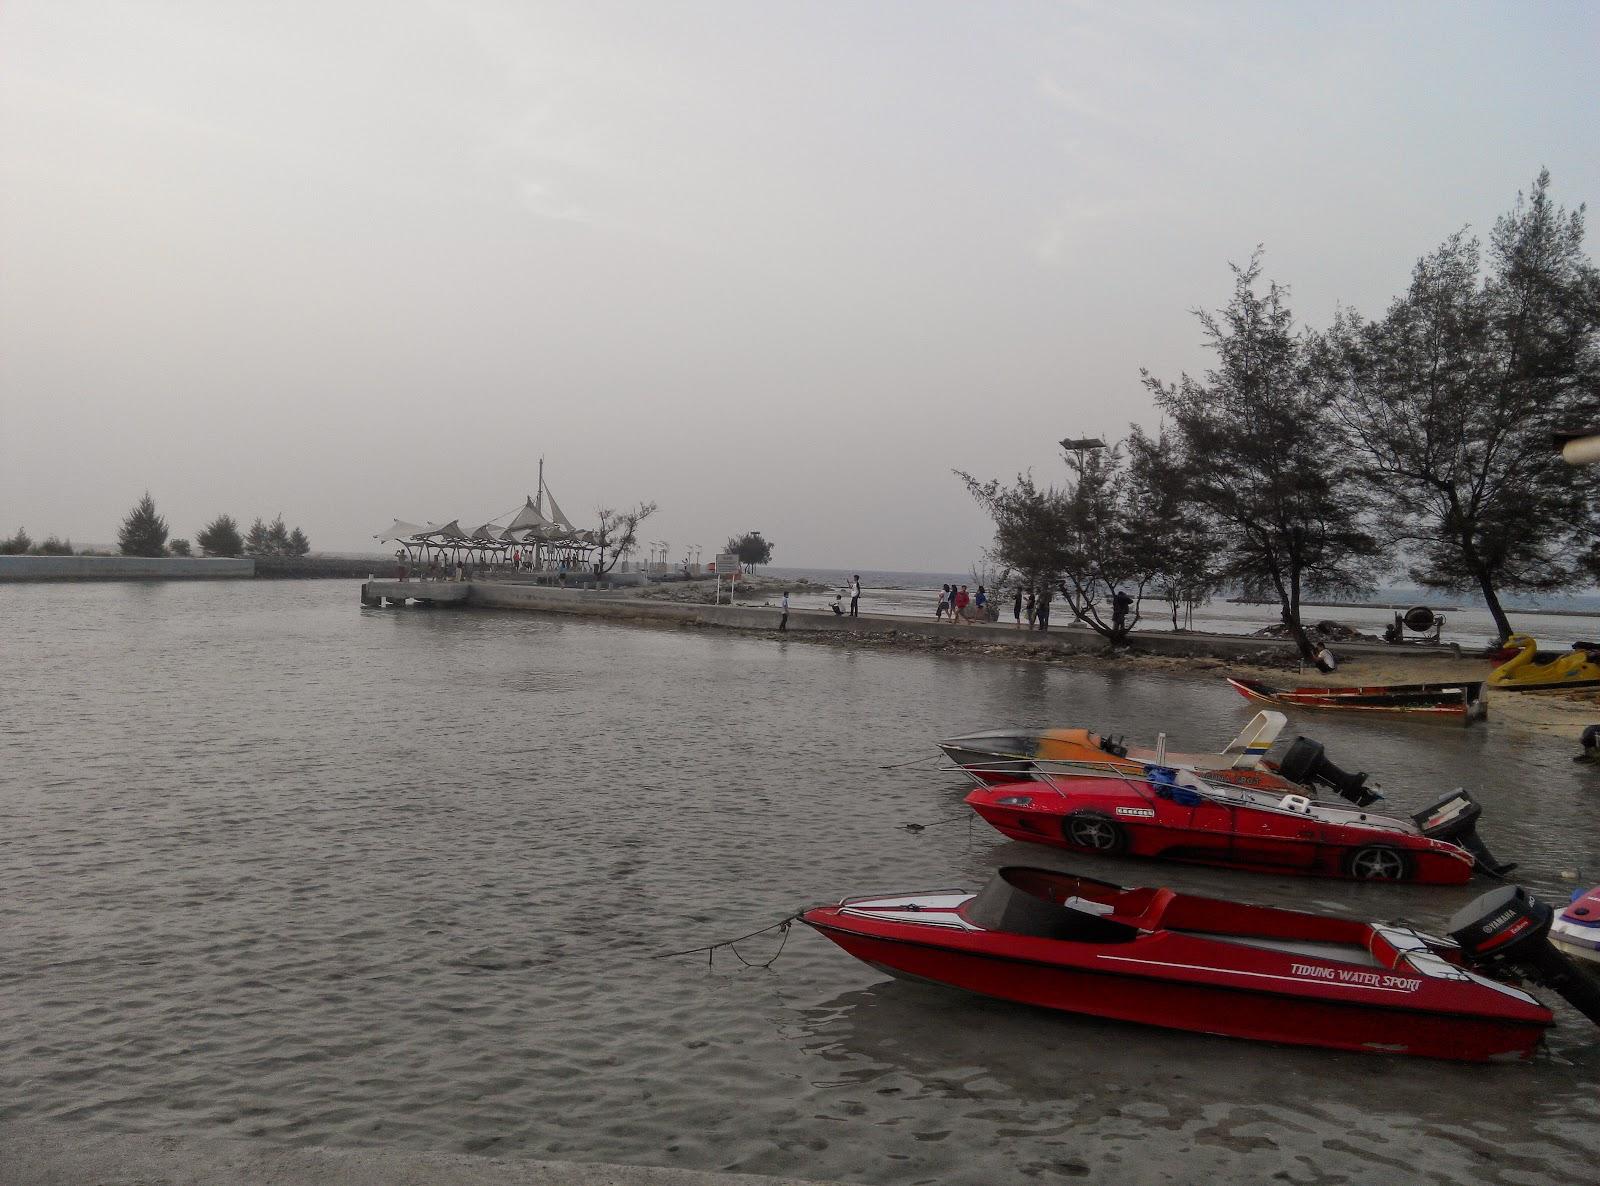 Jetski Pulau Tidung